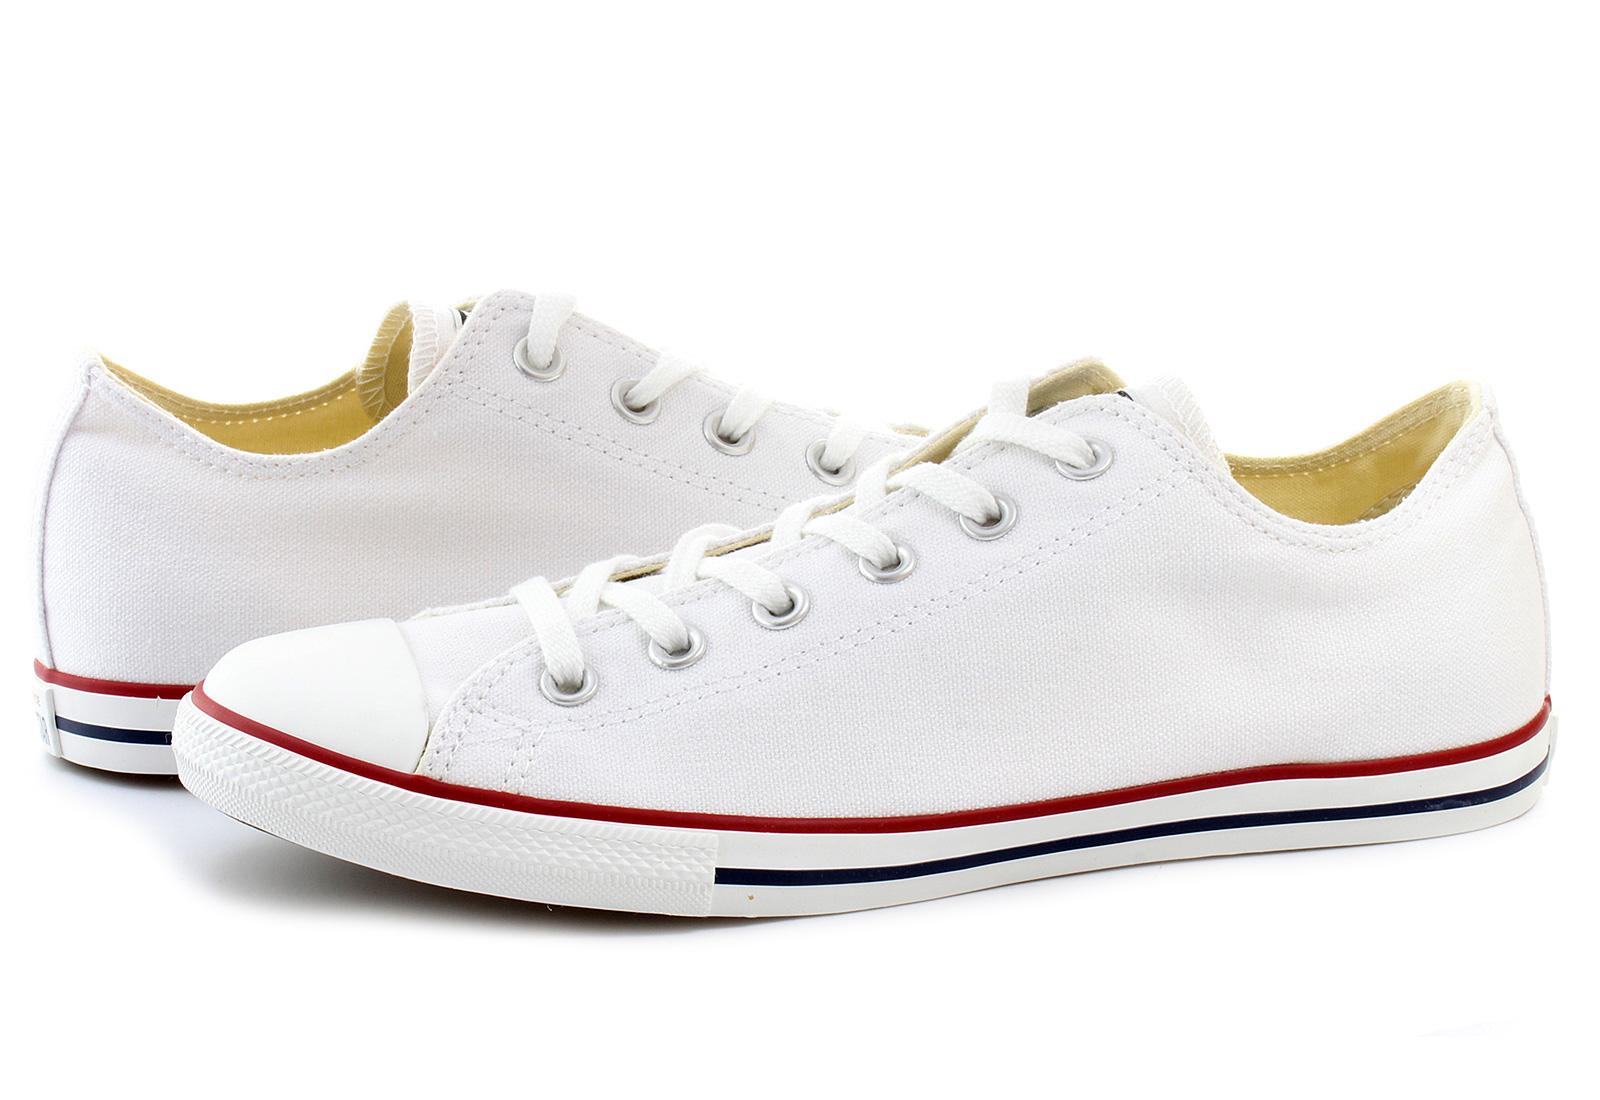 a3e9ac17e41eaf Converse Sneakers - Chuck Taylor All Star Lean Ox - 142270c - Online ...